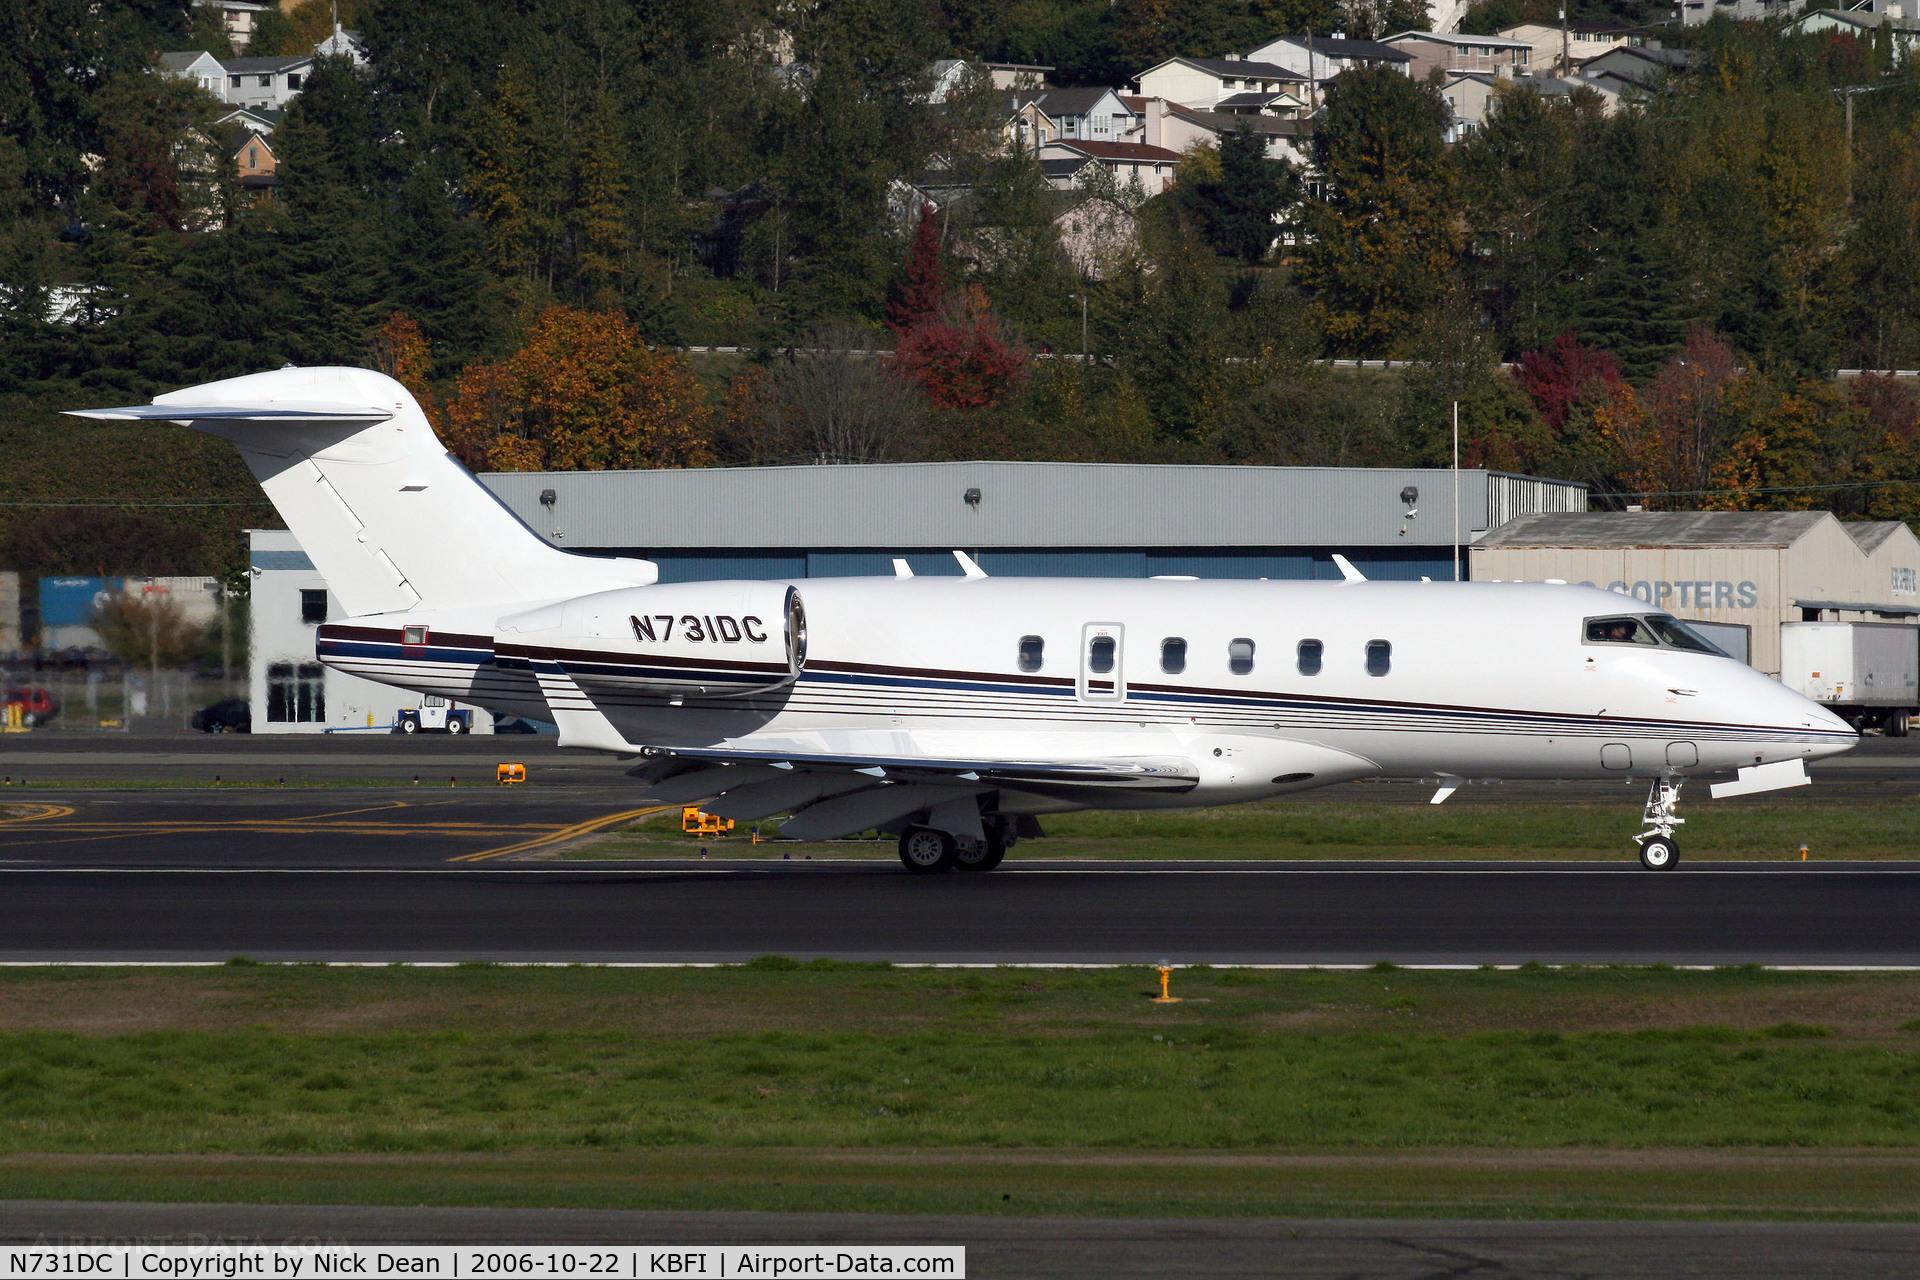 N731DC, 2005 Bombardier Challenger 300 (BD-100-1A10) C/N 20073, KBFI